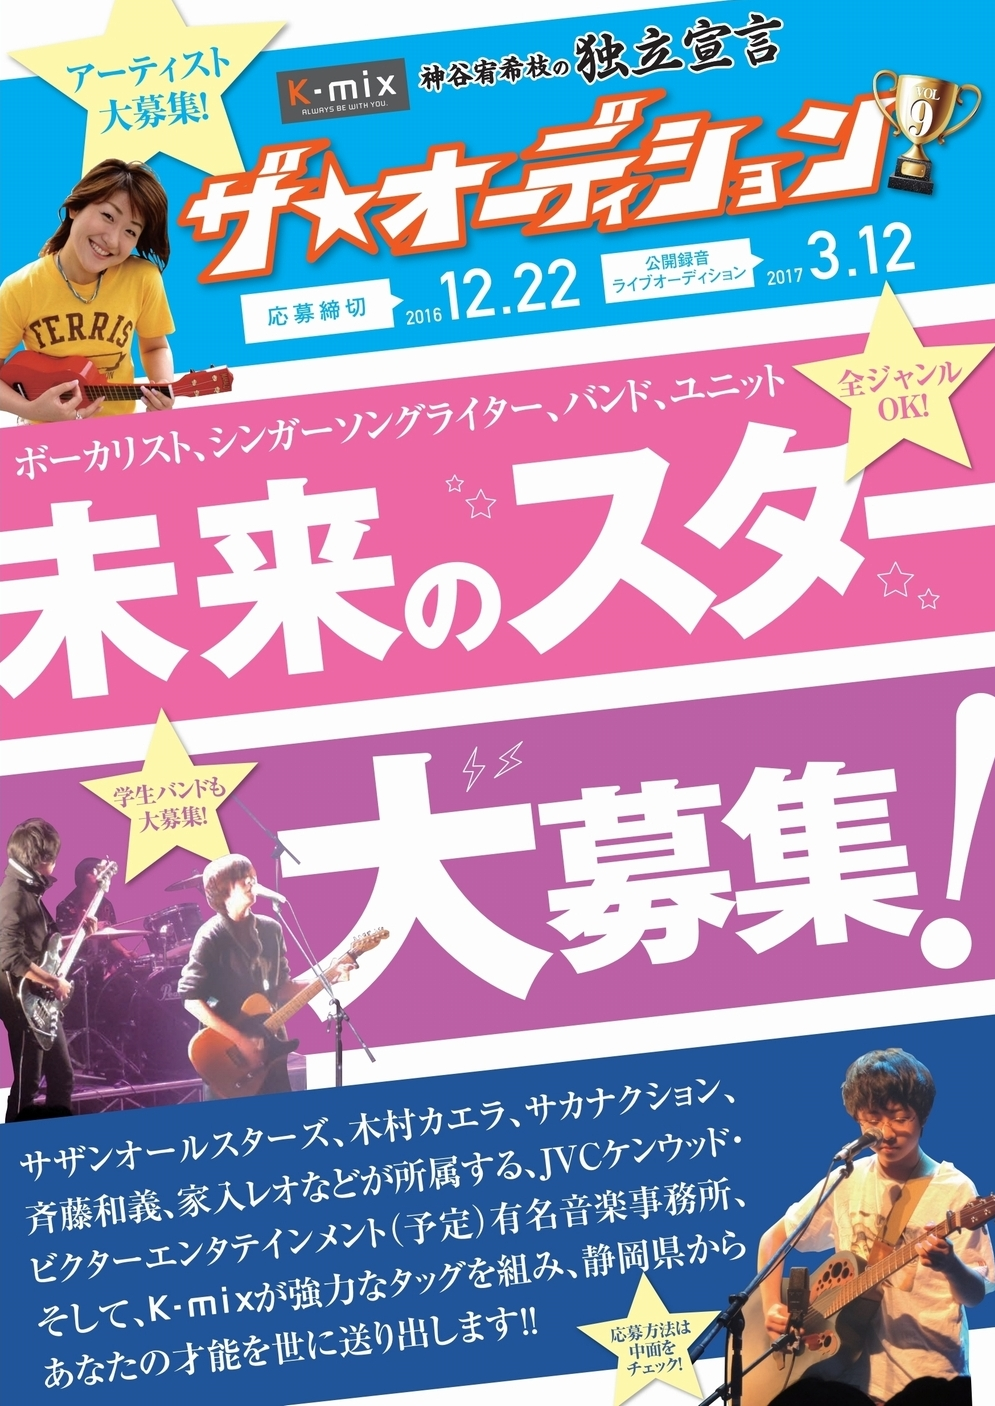 K-mix 神谷宥希枝の独立宣言「ザ・オーディション2017」アーティスト大募集